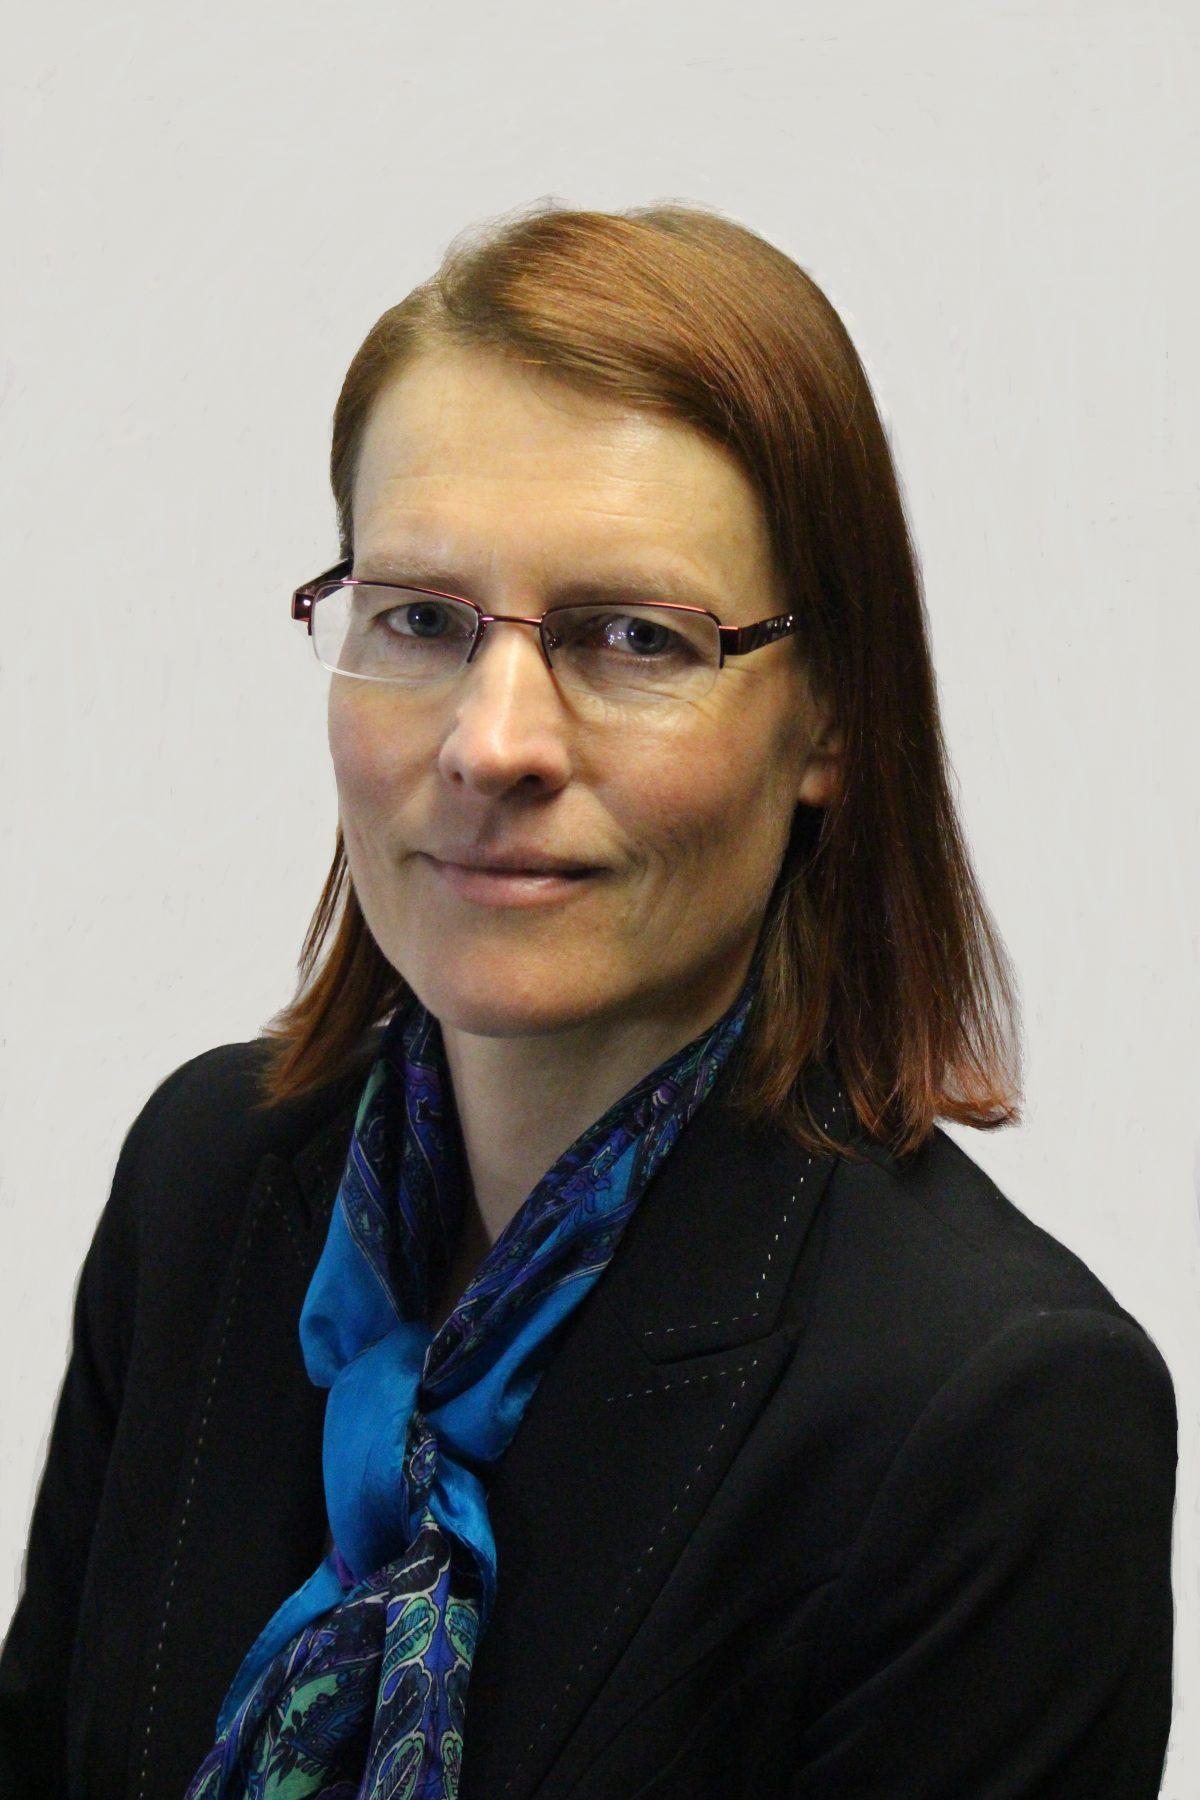 Jitka Pechancova